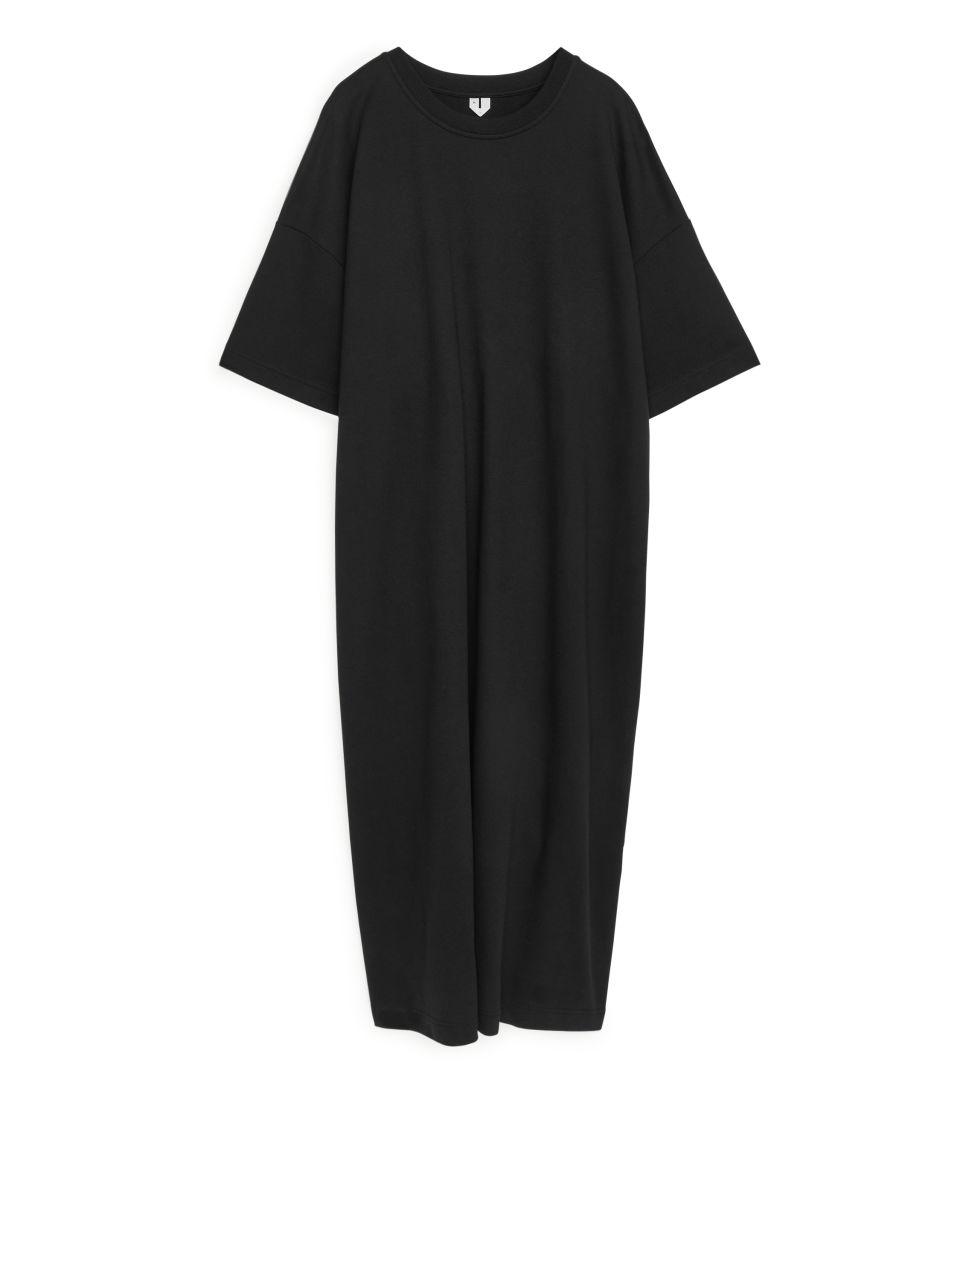 Drawstring-Detail T-Shirt Dress - Black